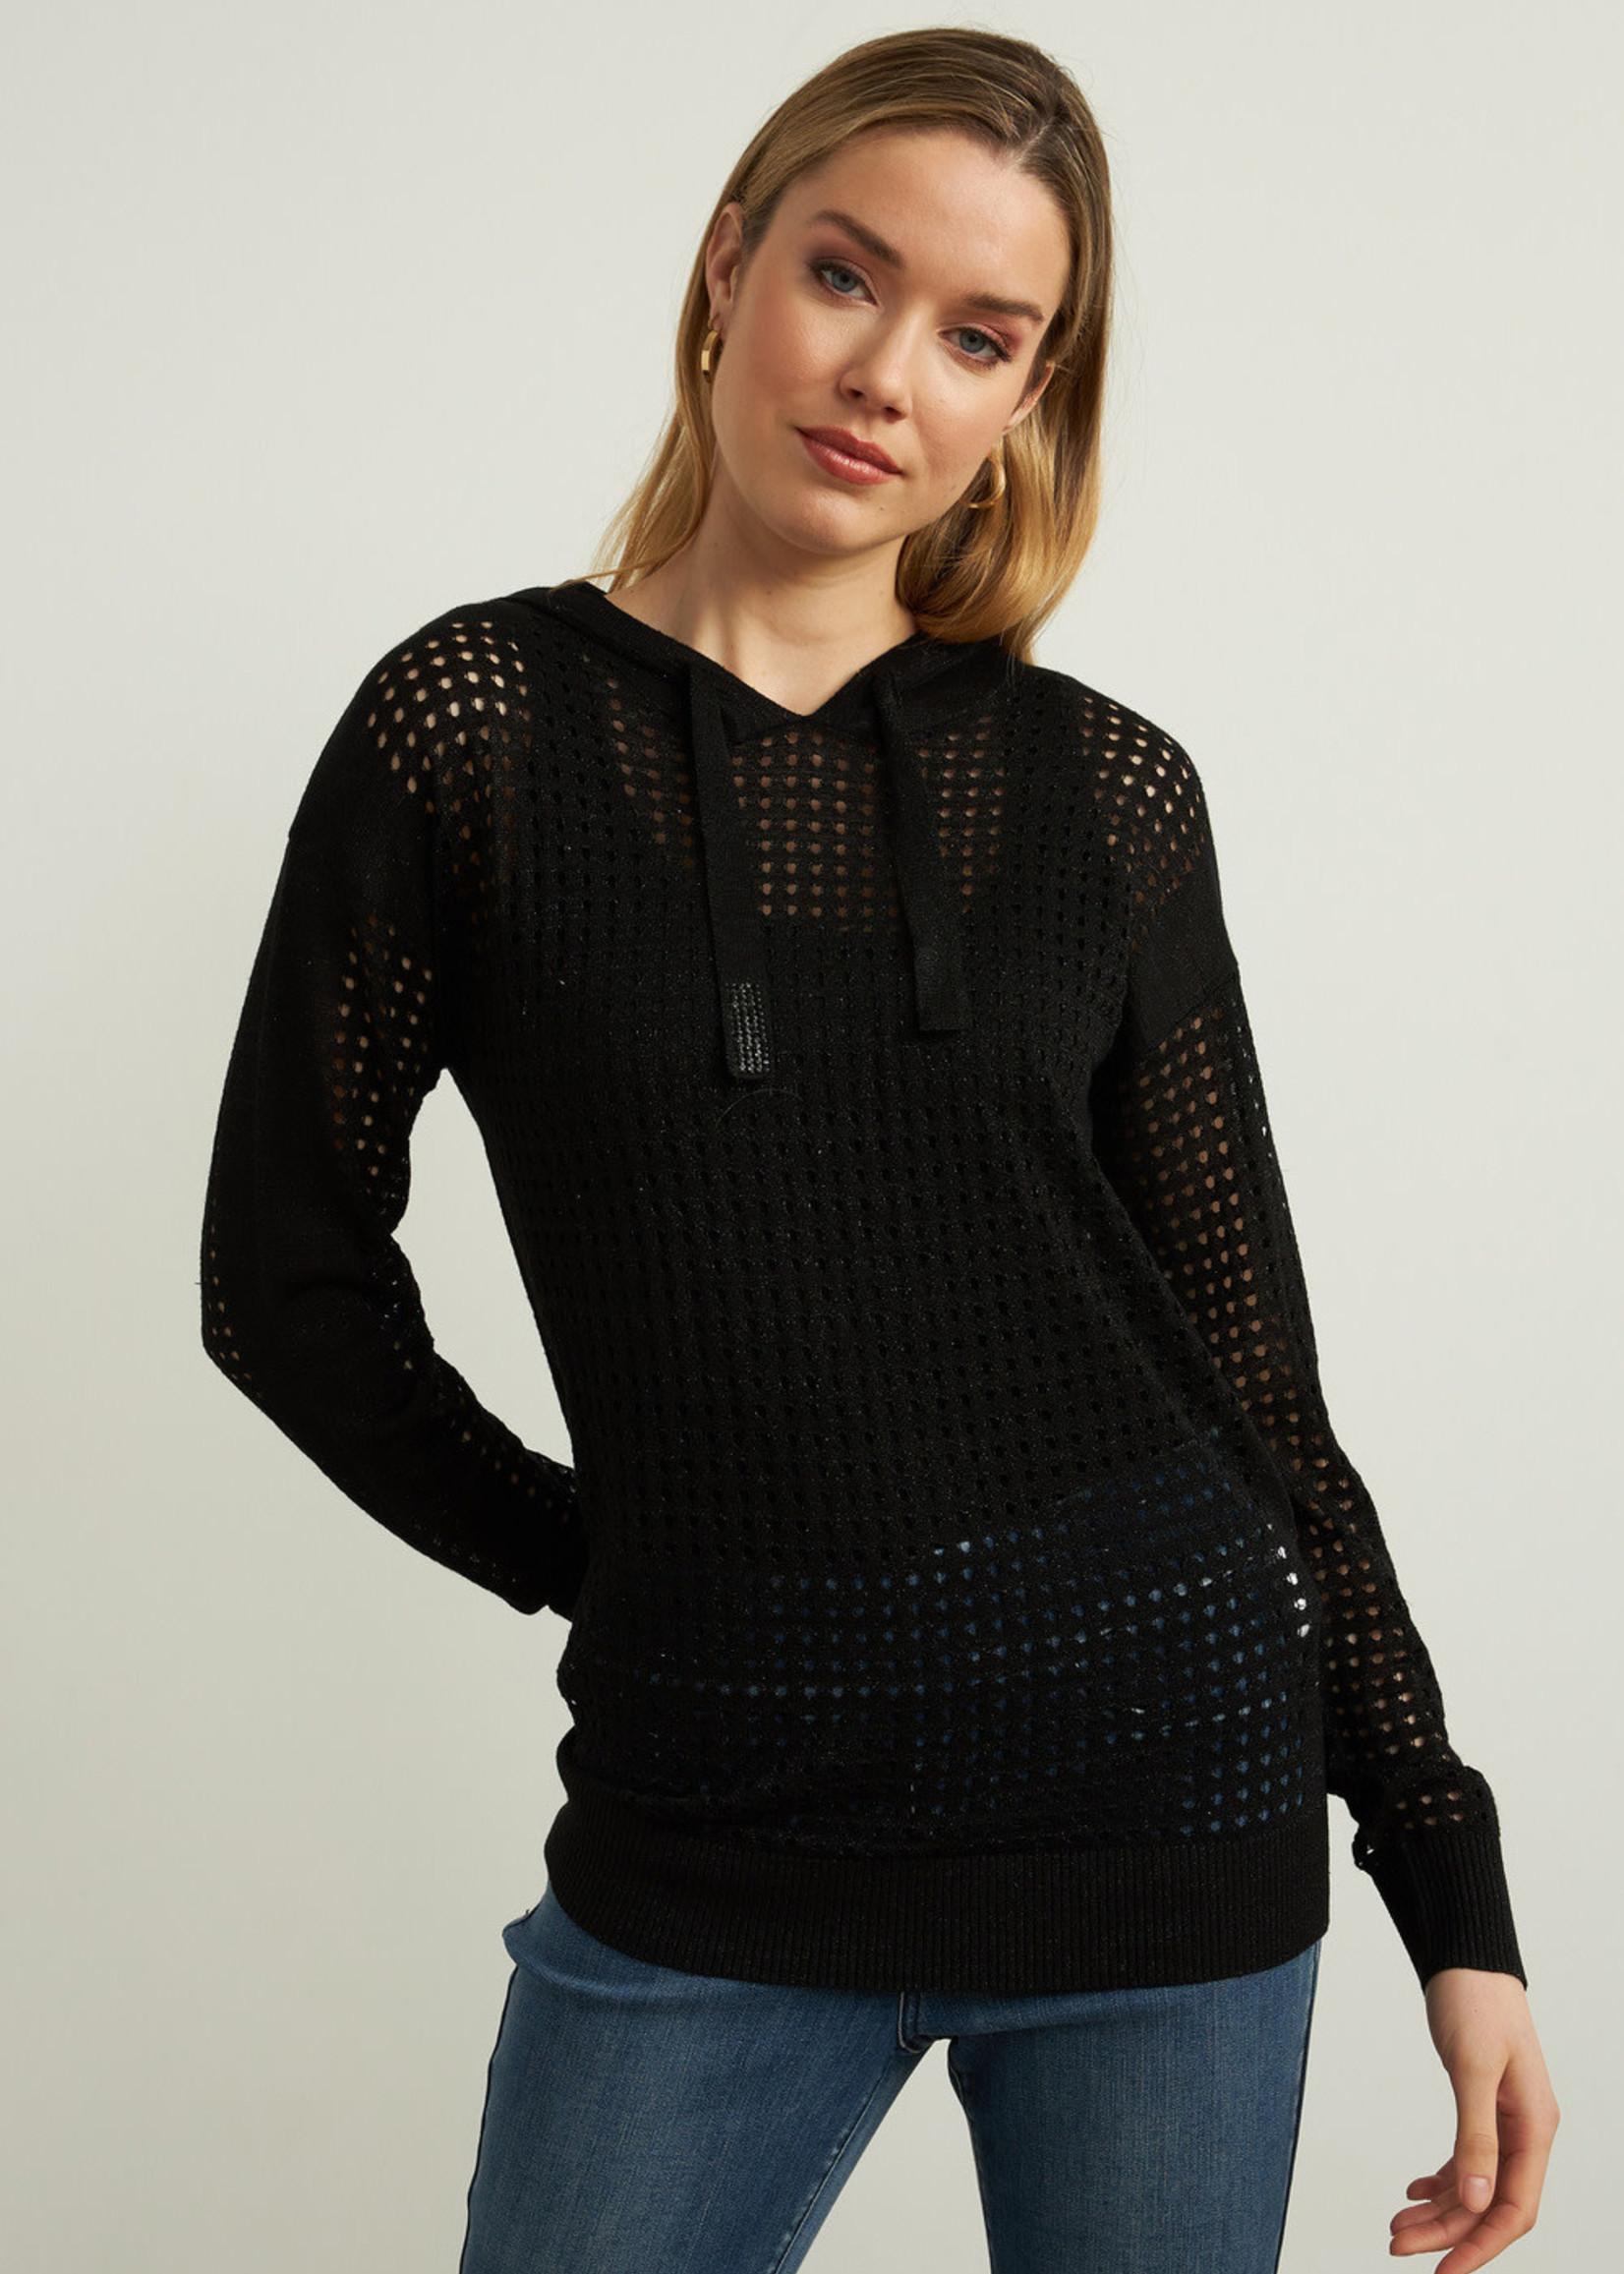 Joseph Ribkoff Joseph Ribkoff Perforated Sweater